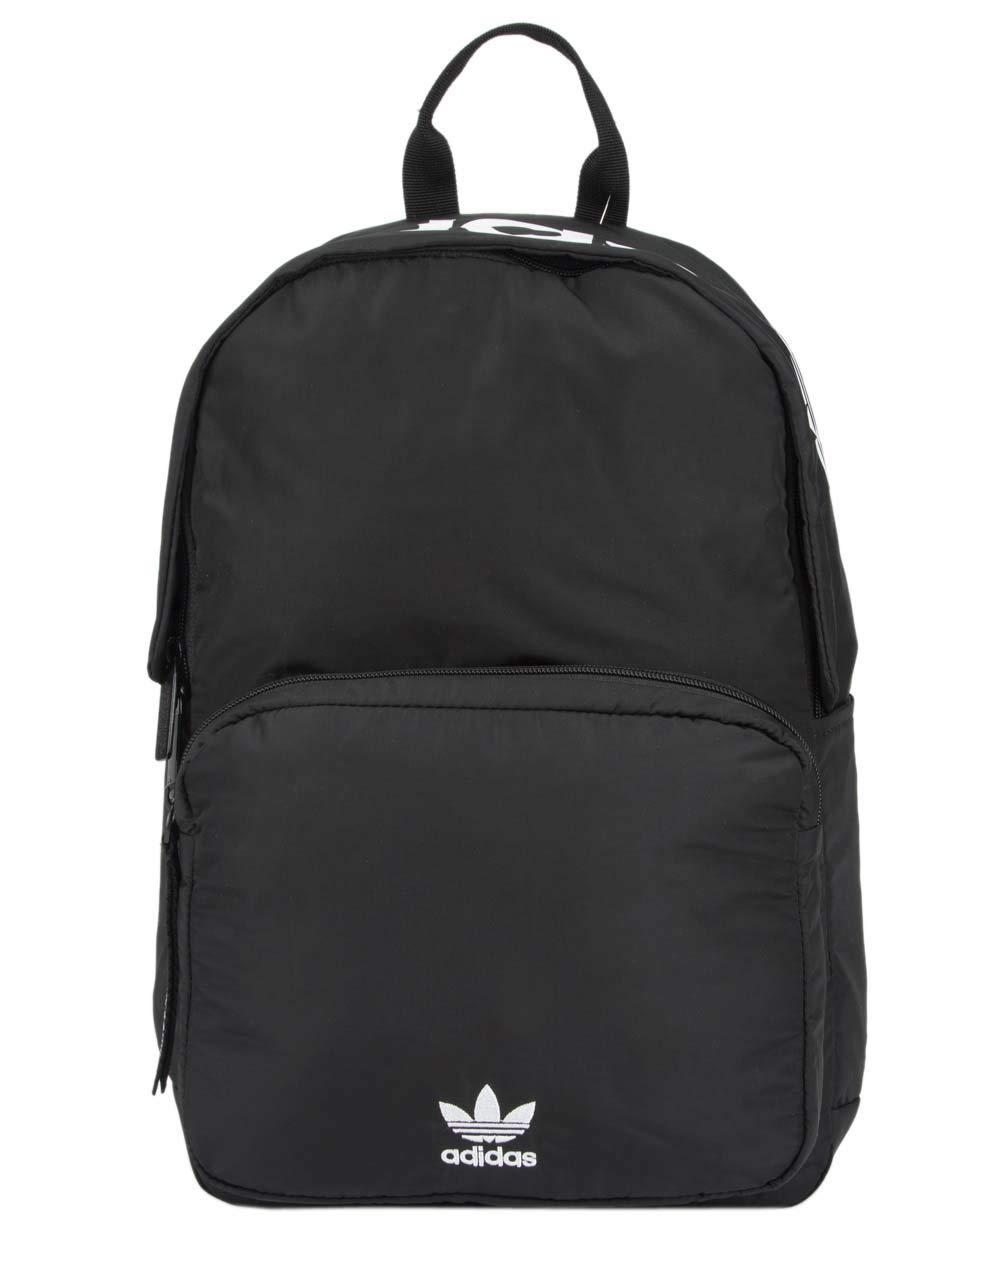 ADIDAS Originals Forum Black Backpack, Black by adidas